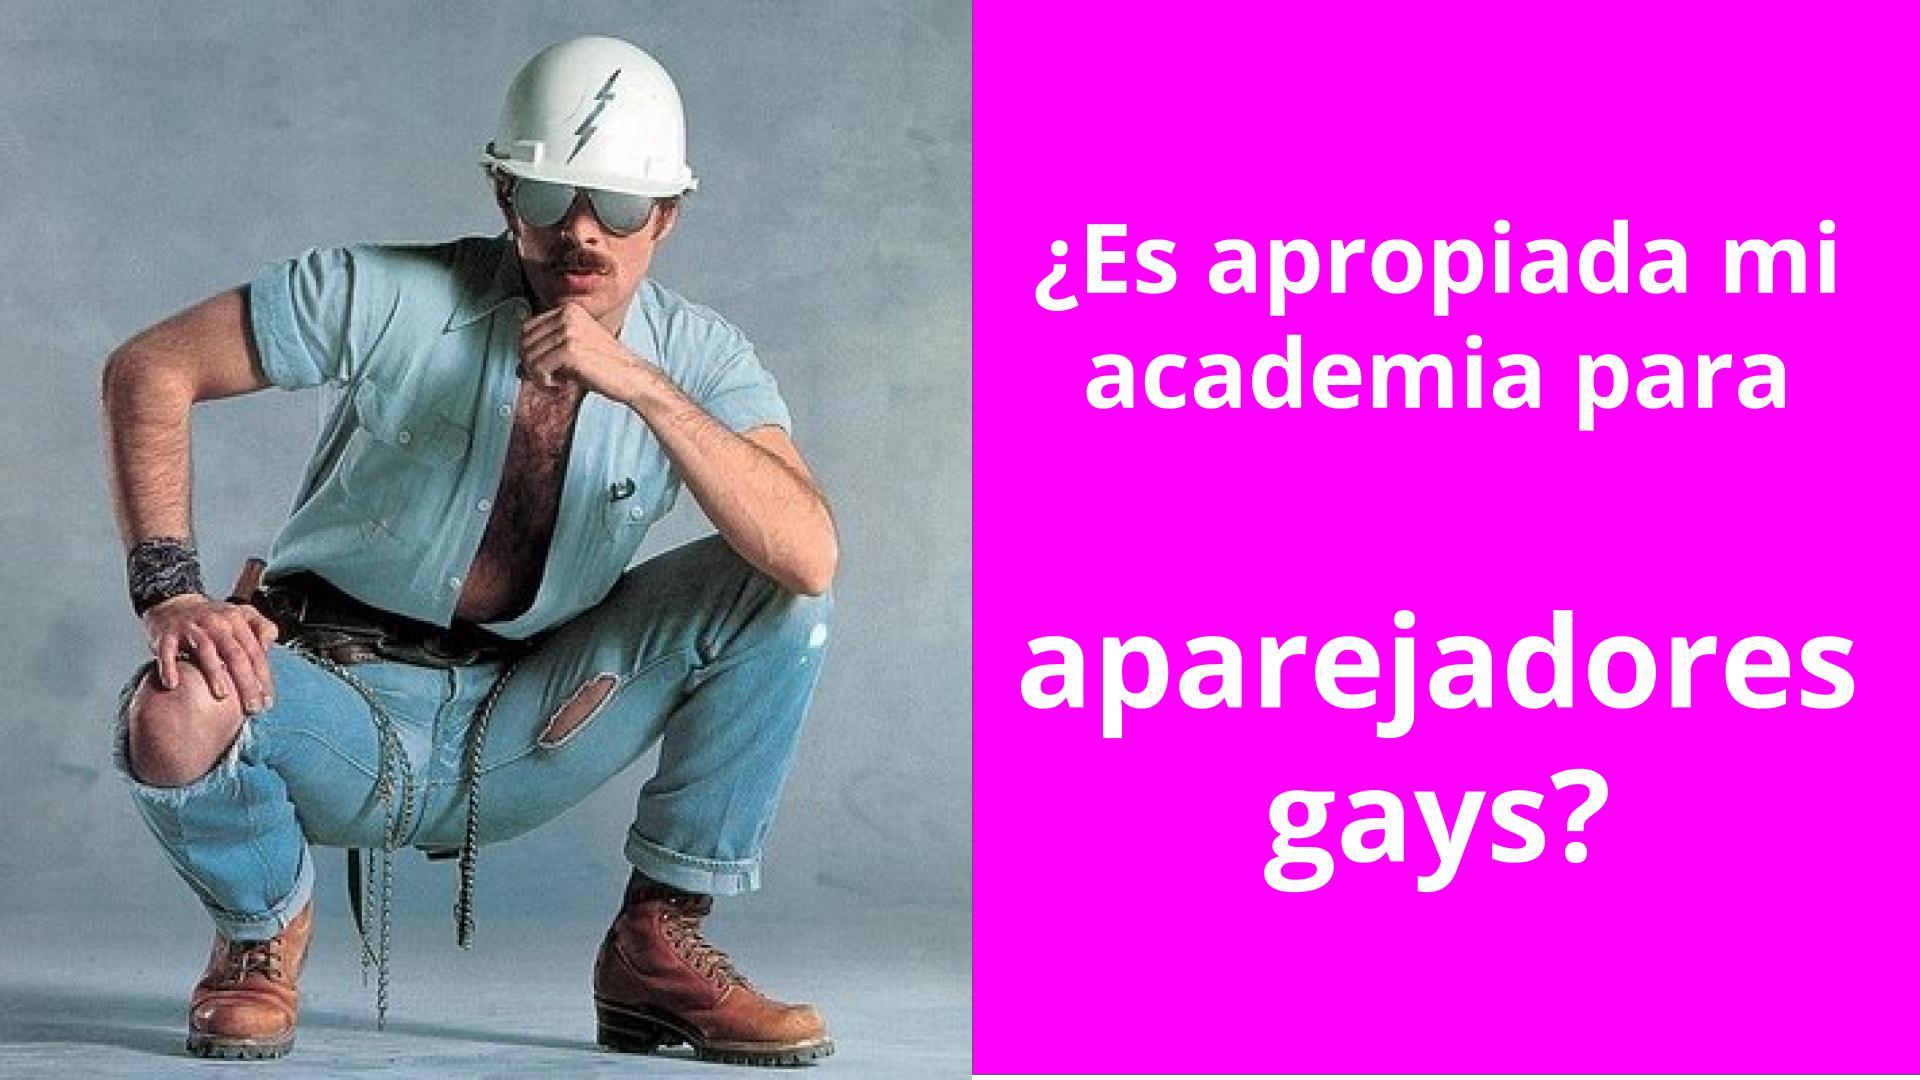 academia para aparejadores gays